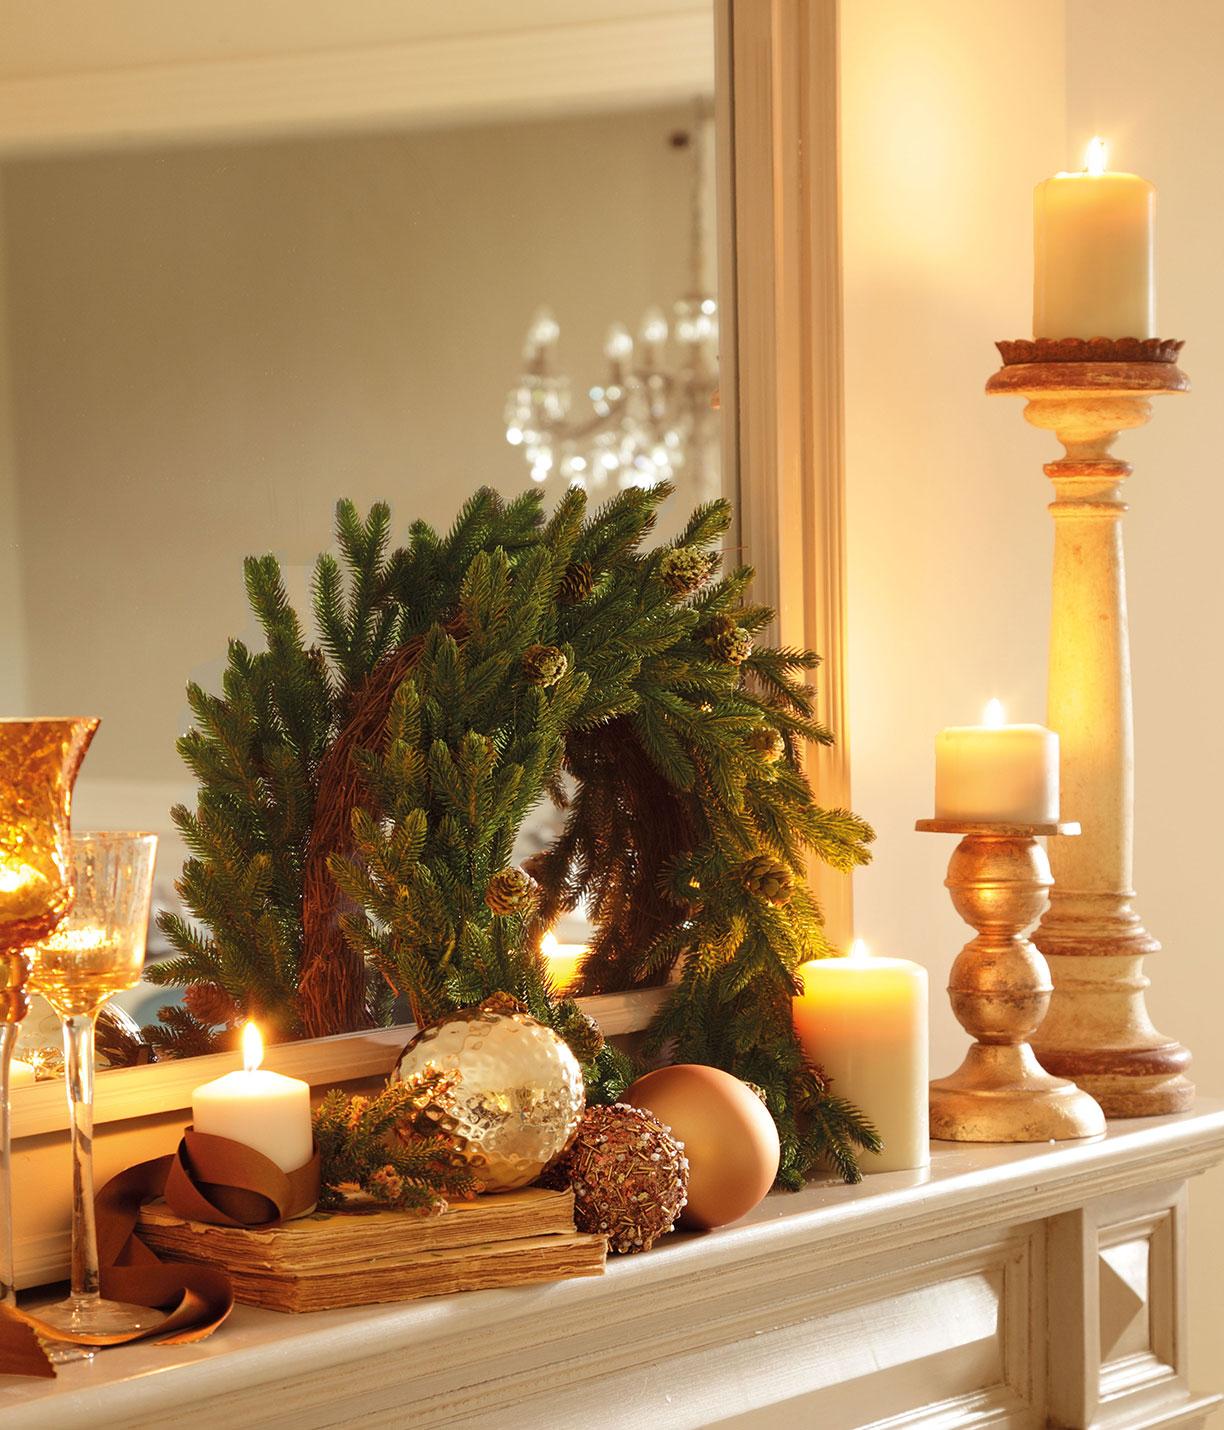 Como decorar una casa pequea latest decoracao casa for App para decorar casas